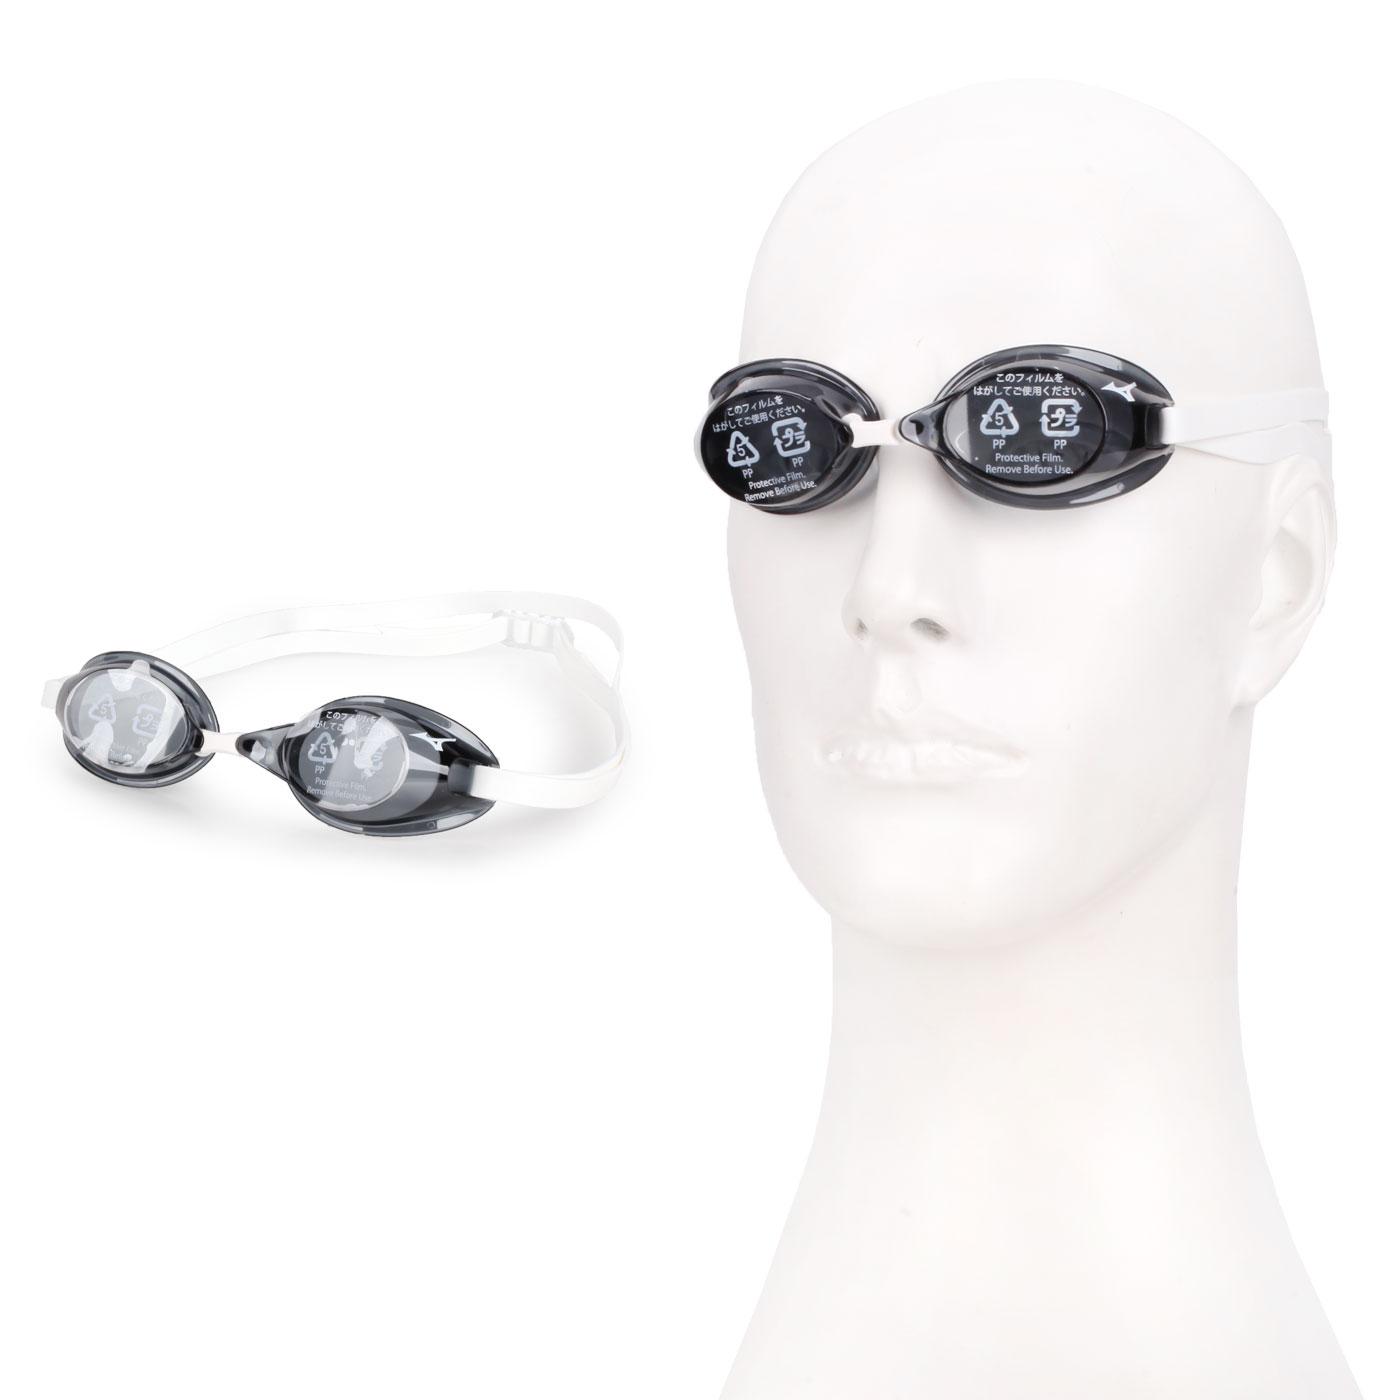 MIZUNO 日製競速型無墊片泳鏡  SWIM85YA-75000-10 - 黑白